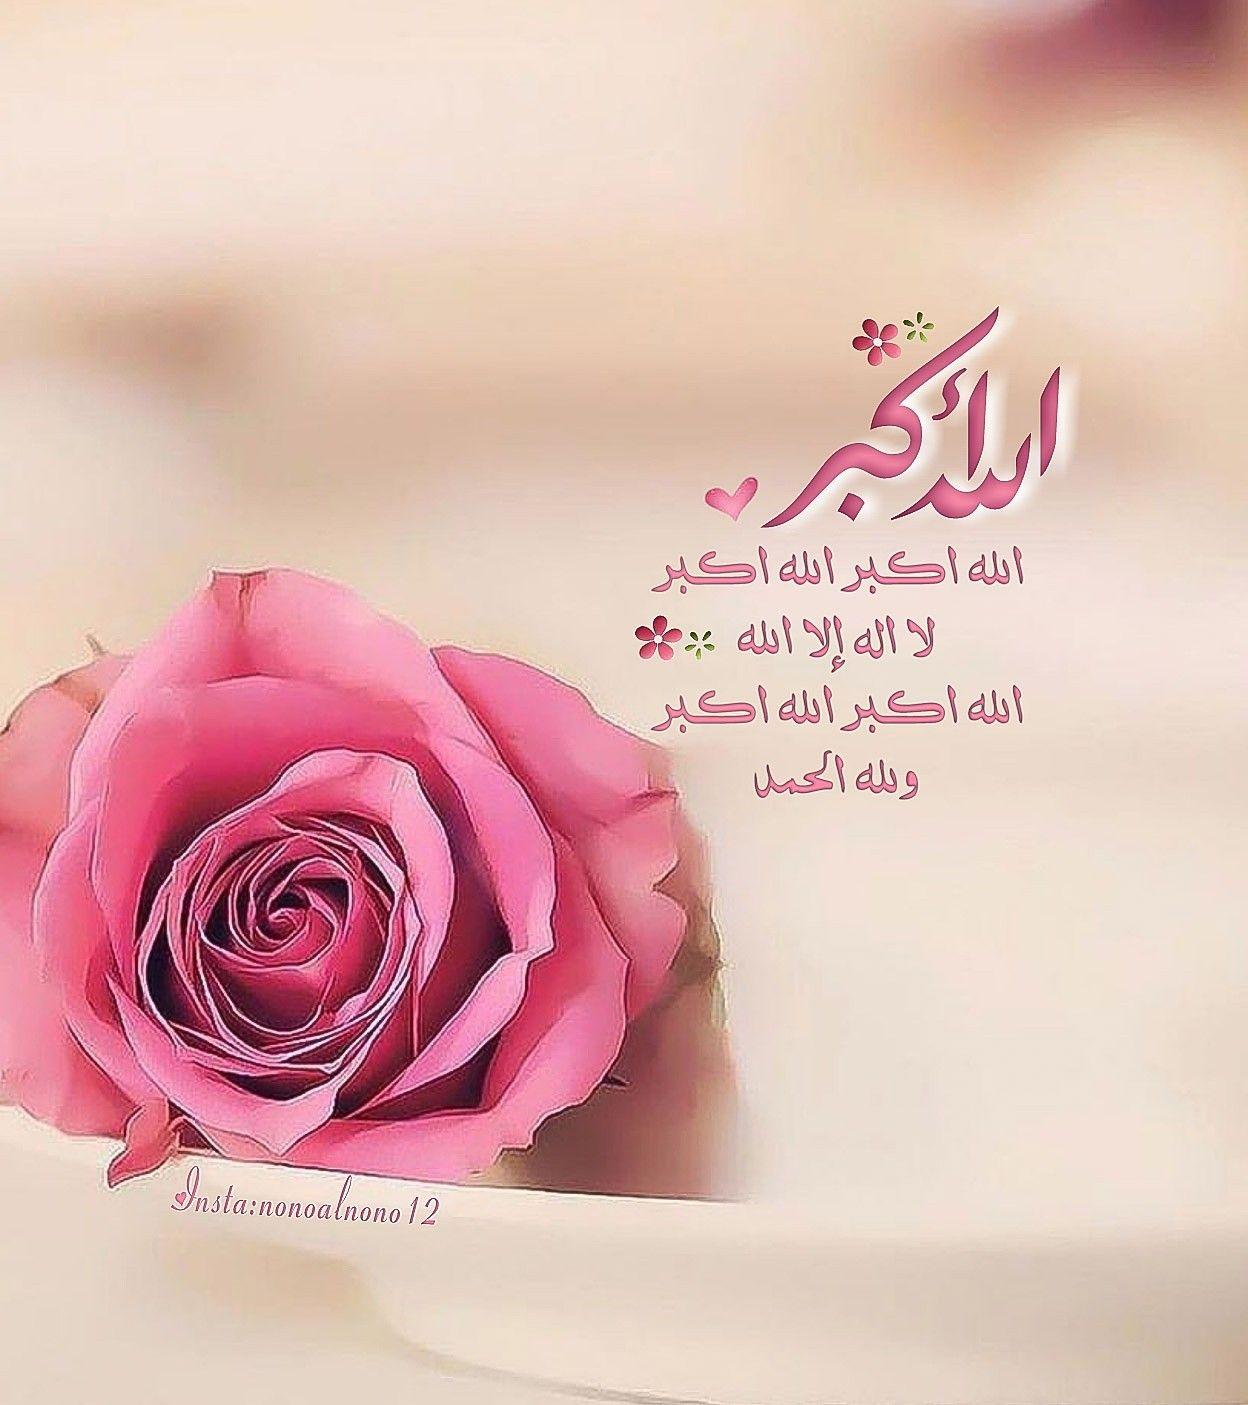 الله اكبر Eid Mubarak Cute Photos Islamic Month